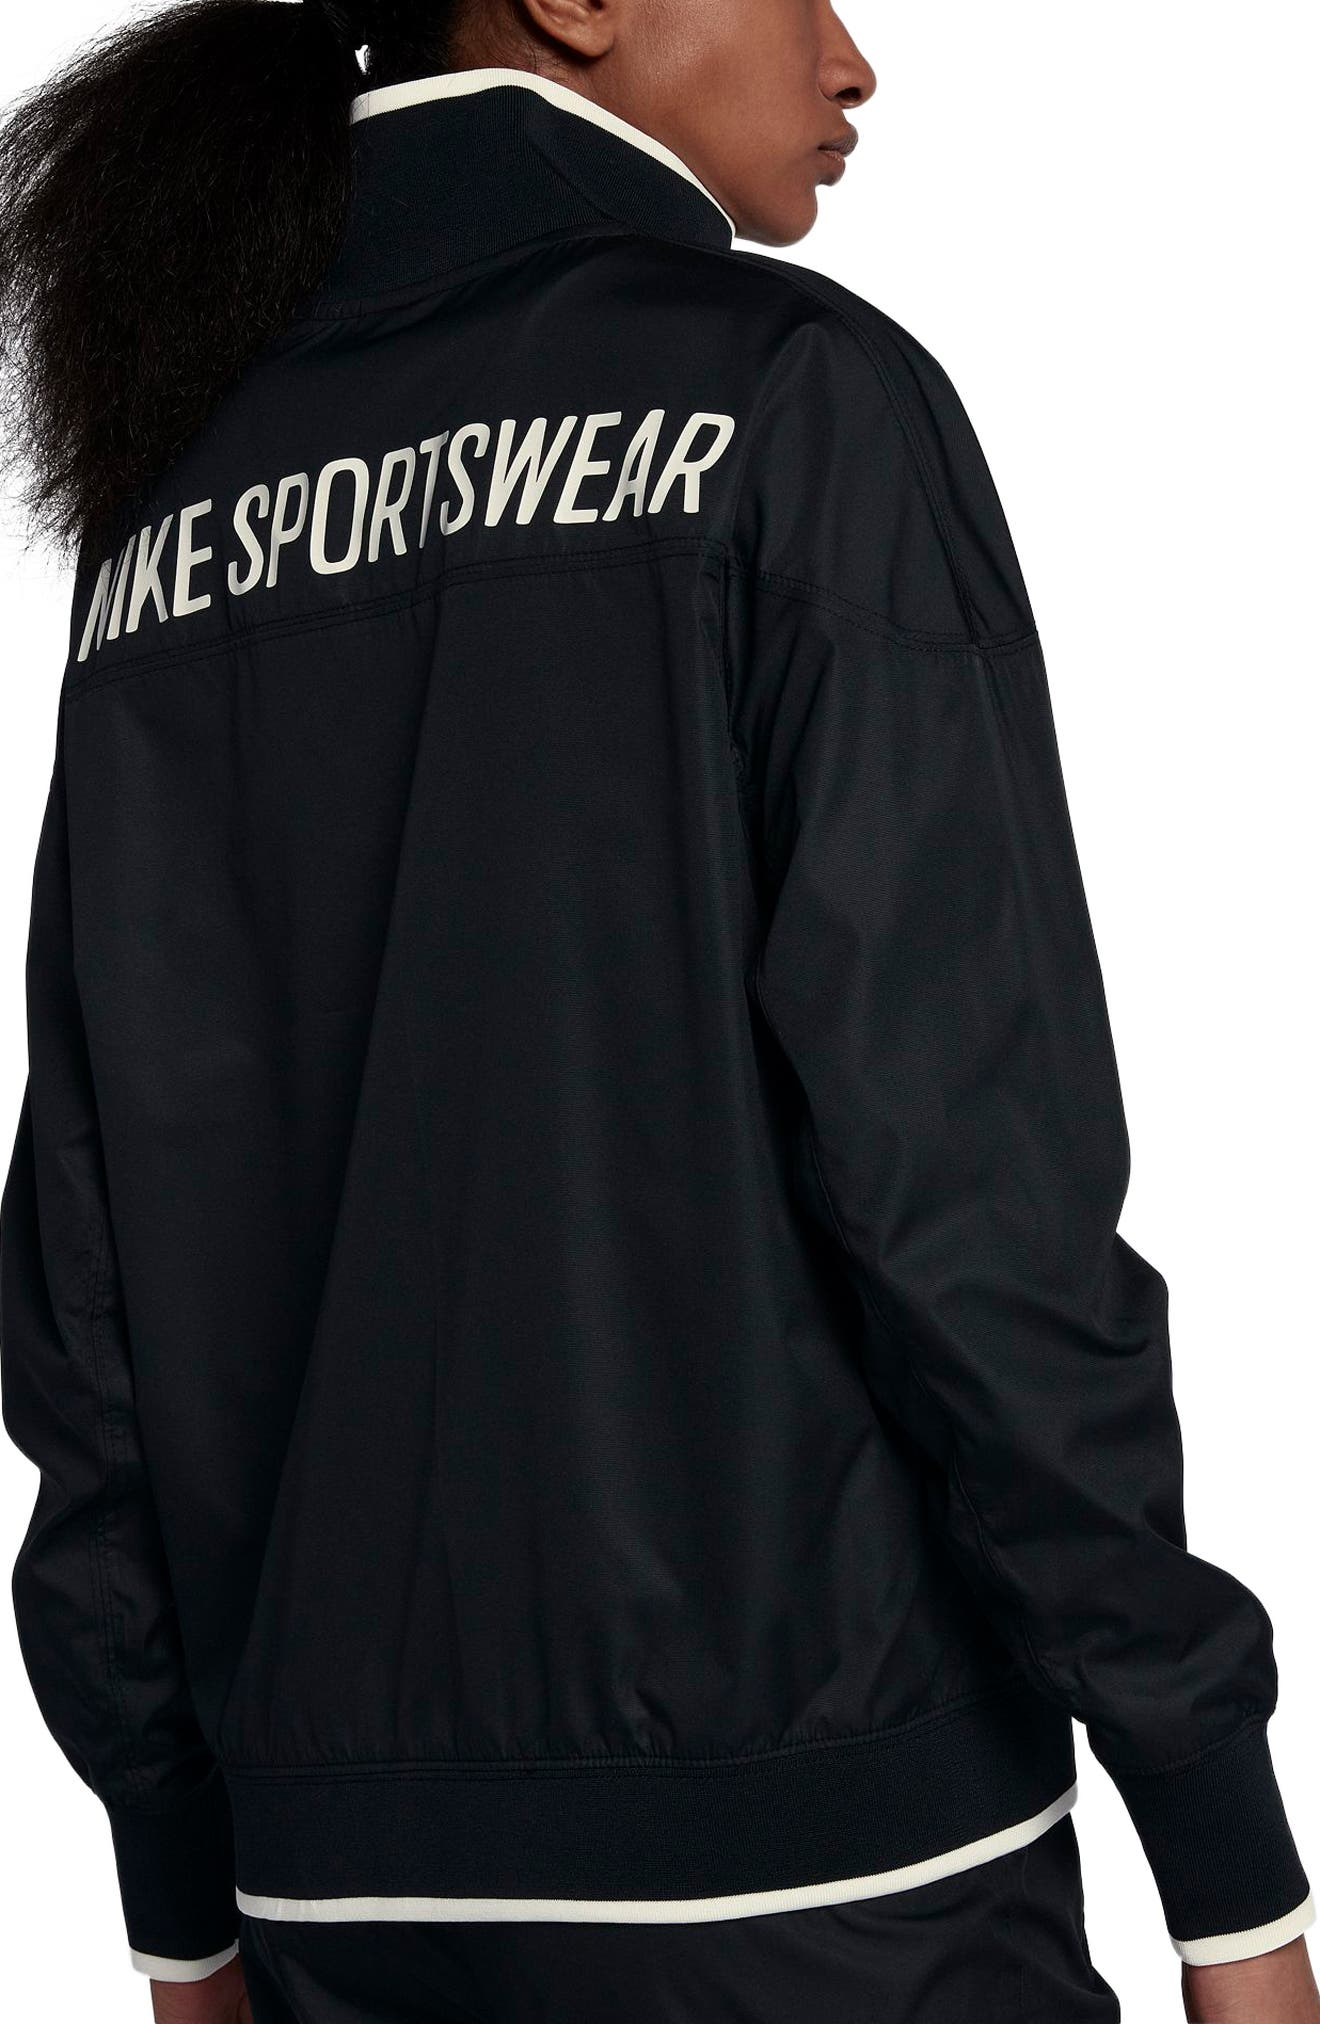 Sportswear Archive Jacket,                             Alternate thumbnail 2, color,                             Black/ Sail